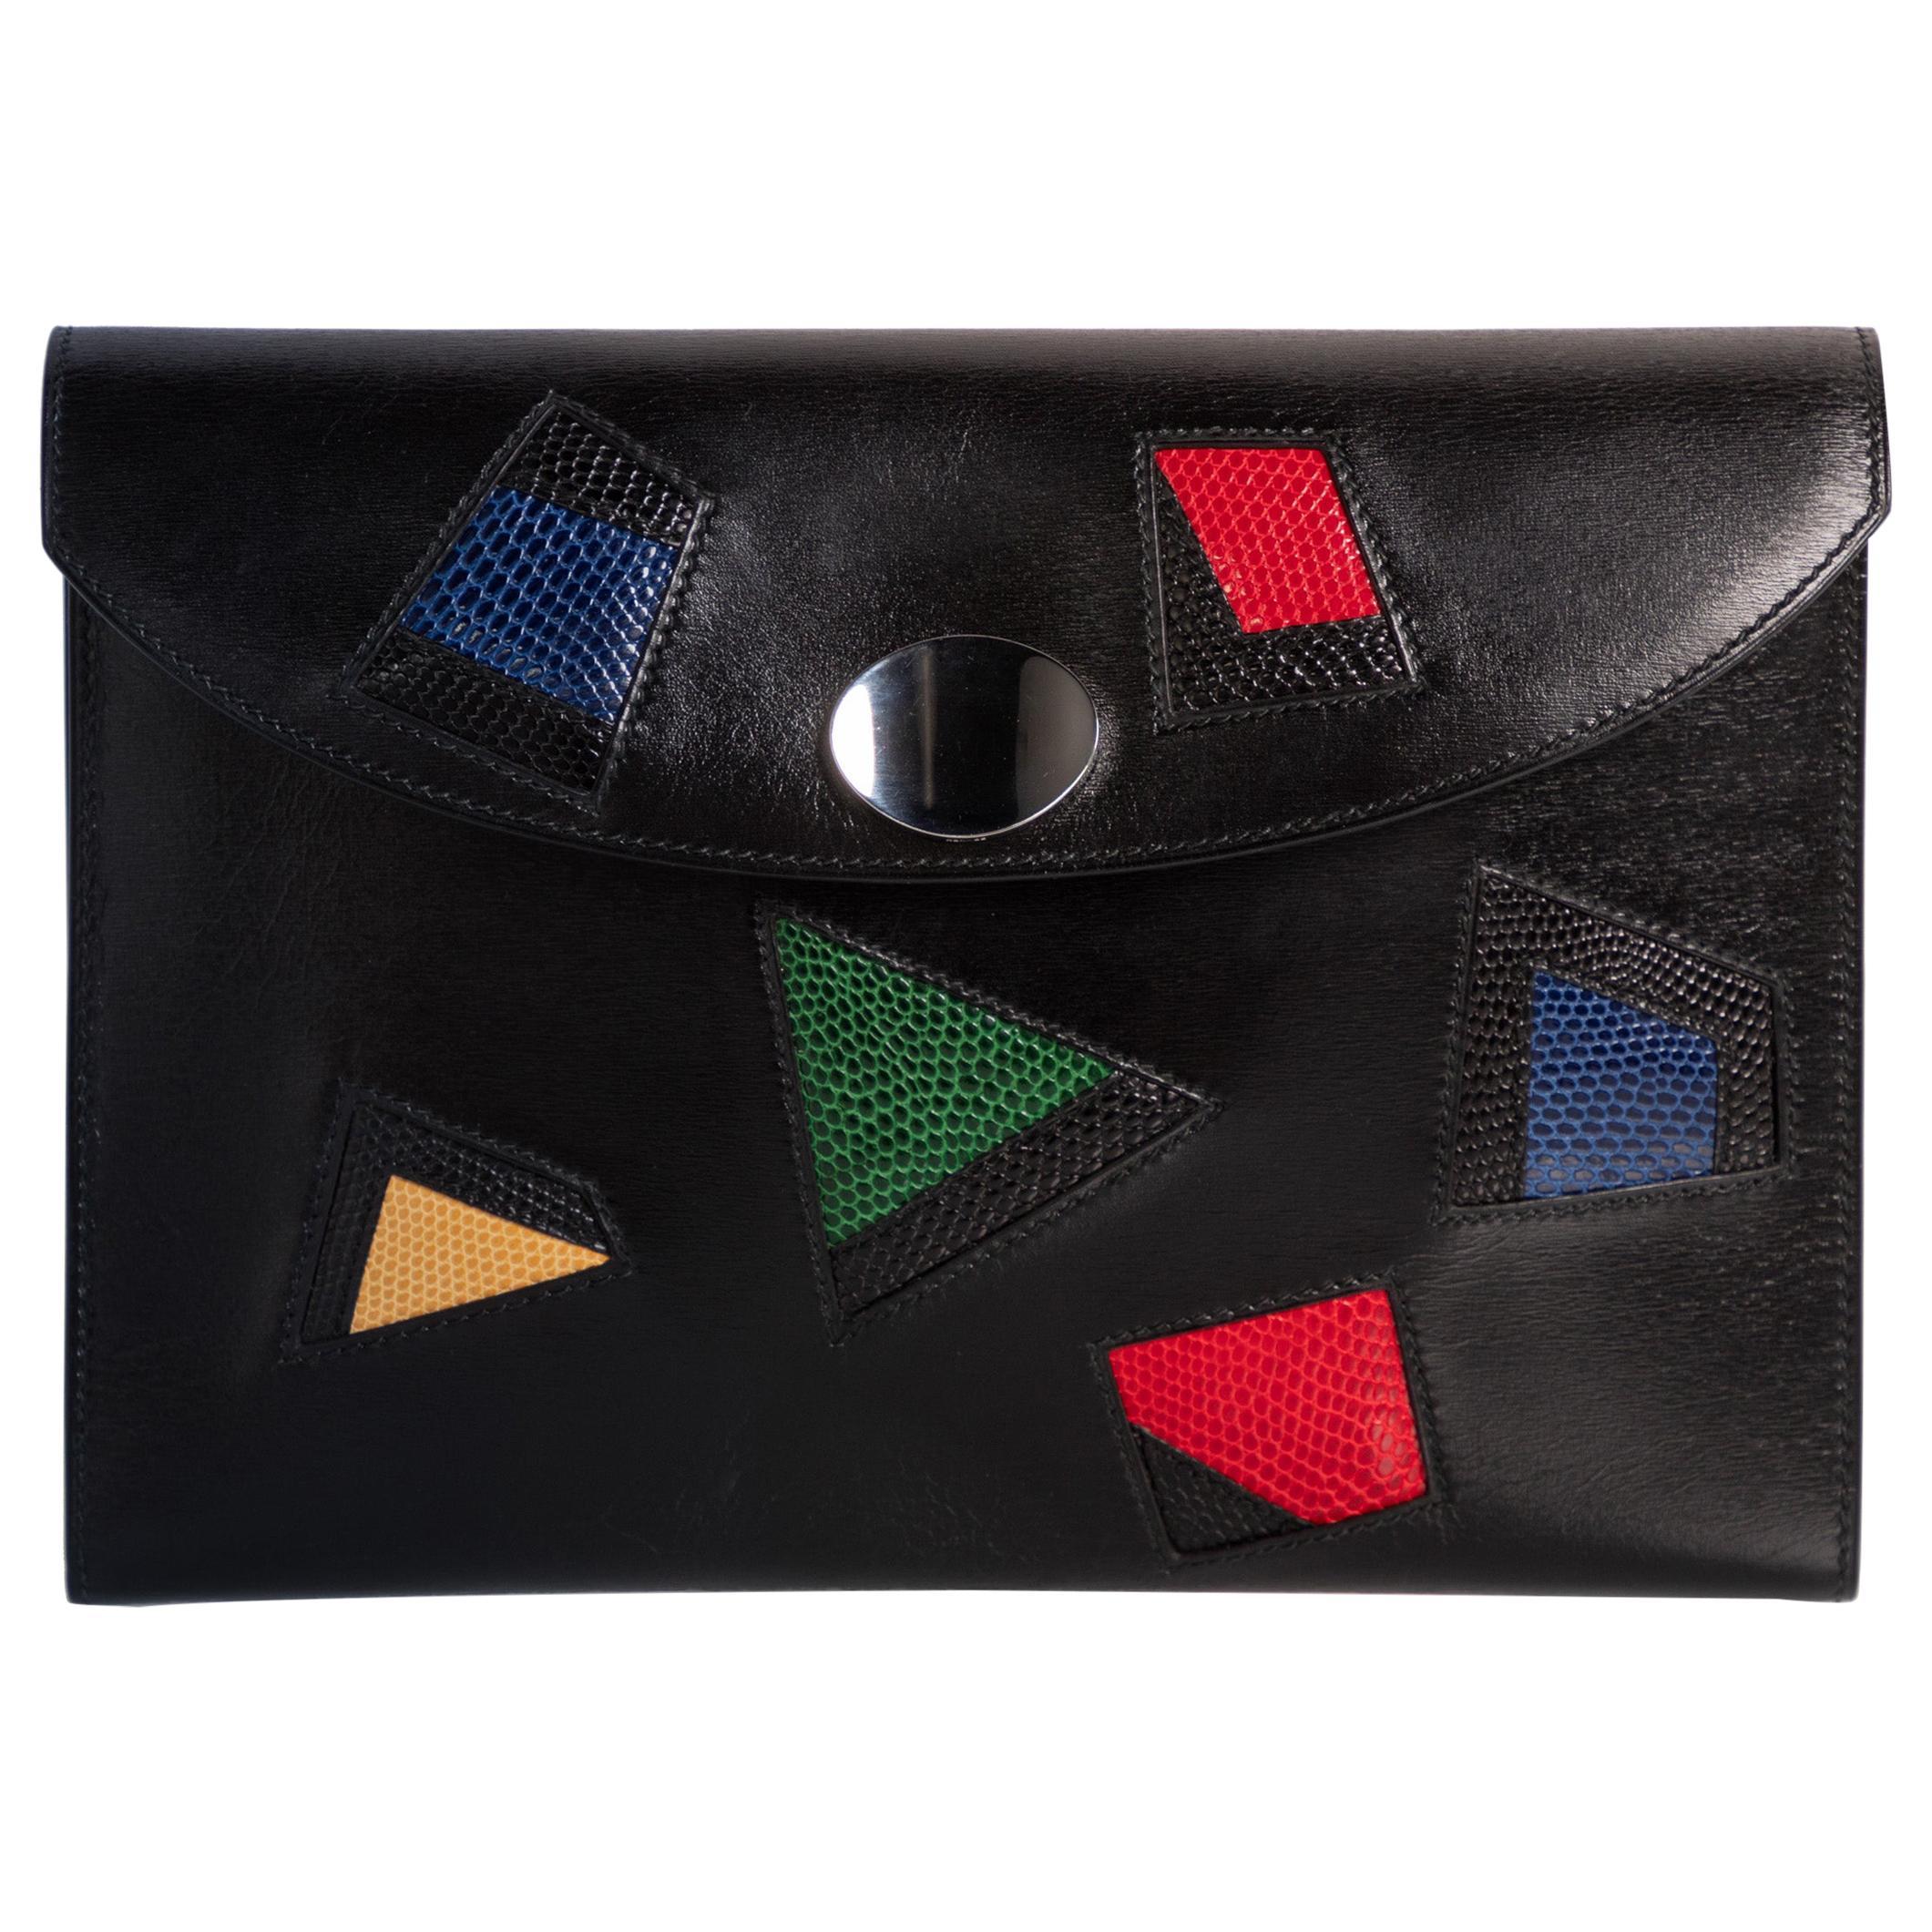 Hermes Black Leather Multicolored Lizard Rio Nuage Clutch Rare, 1980s